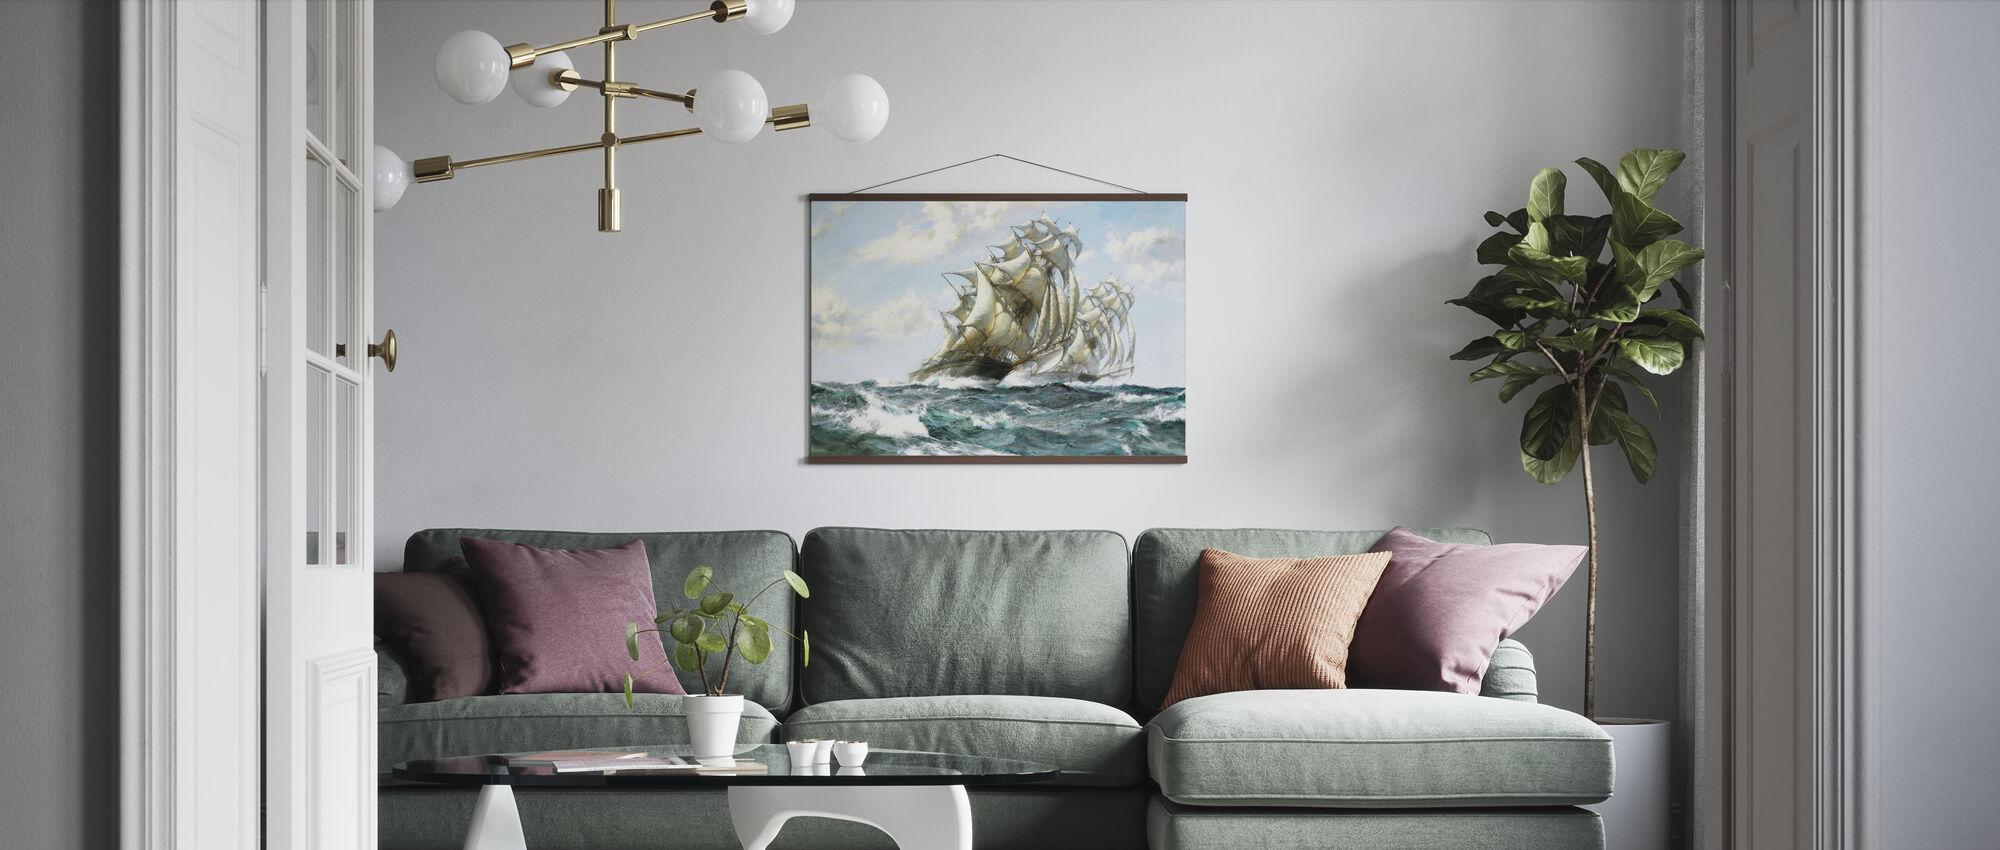 Turbulent Navigation - Poster - Living Room